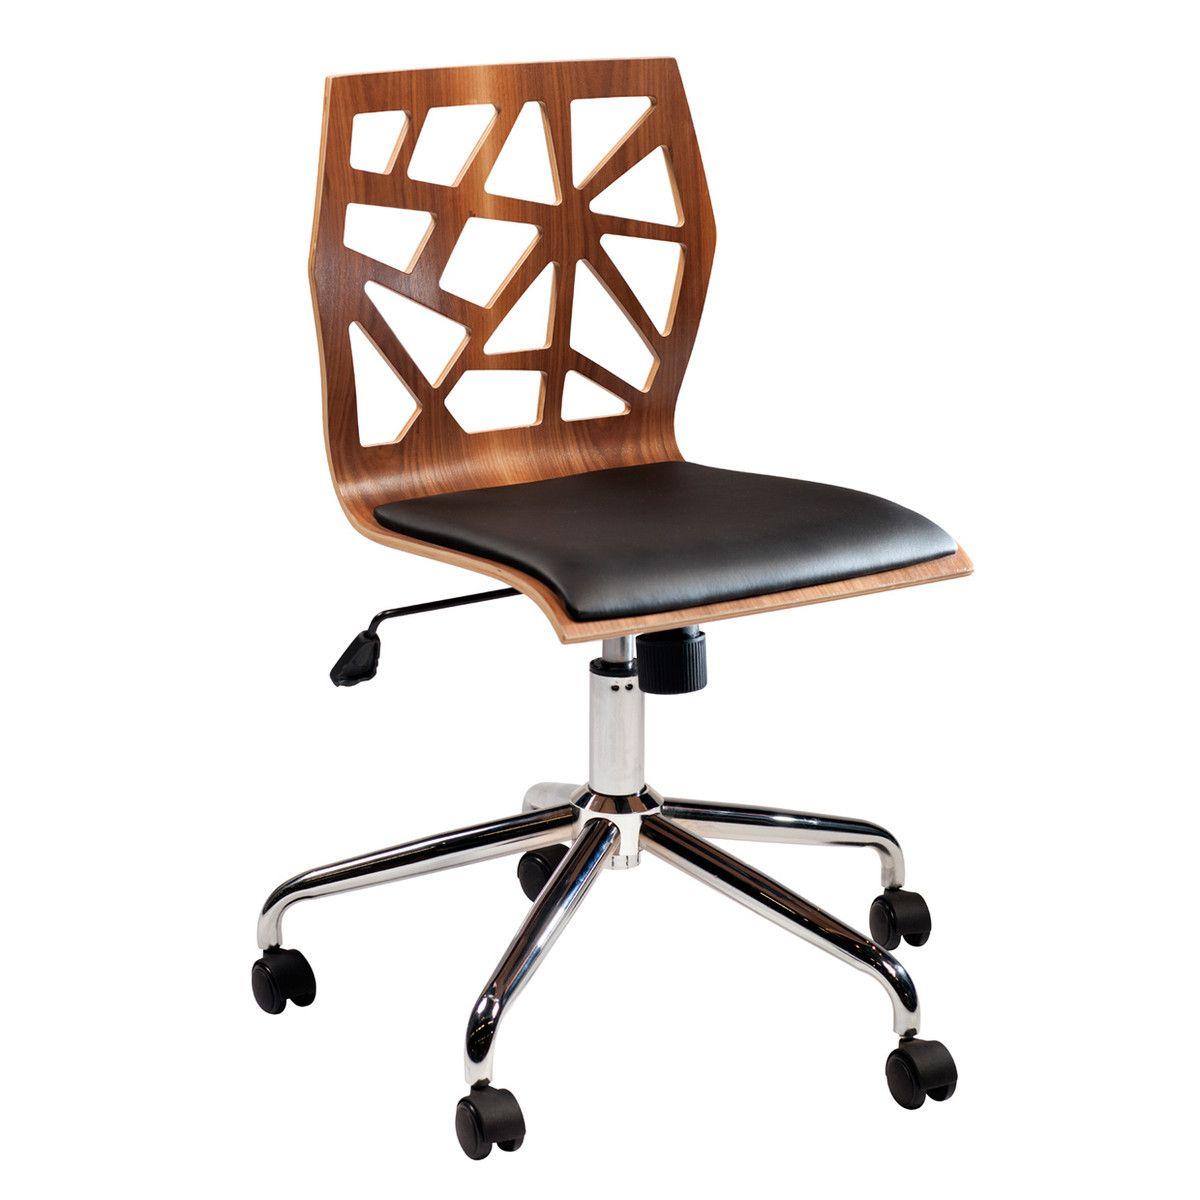 funky office chairs. Funky Office Chair Chairs A